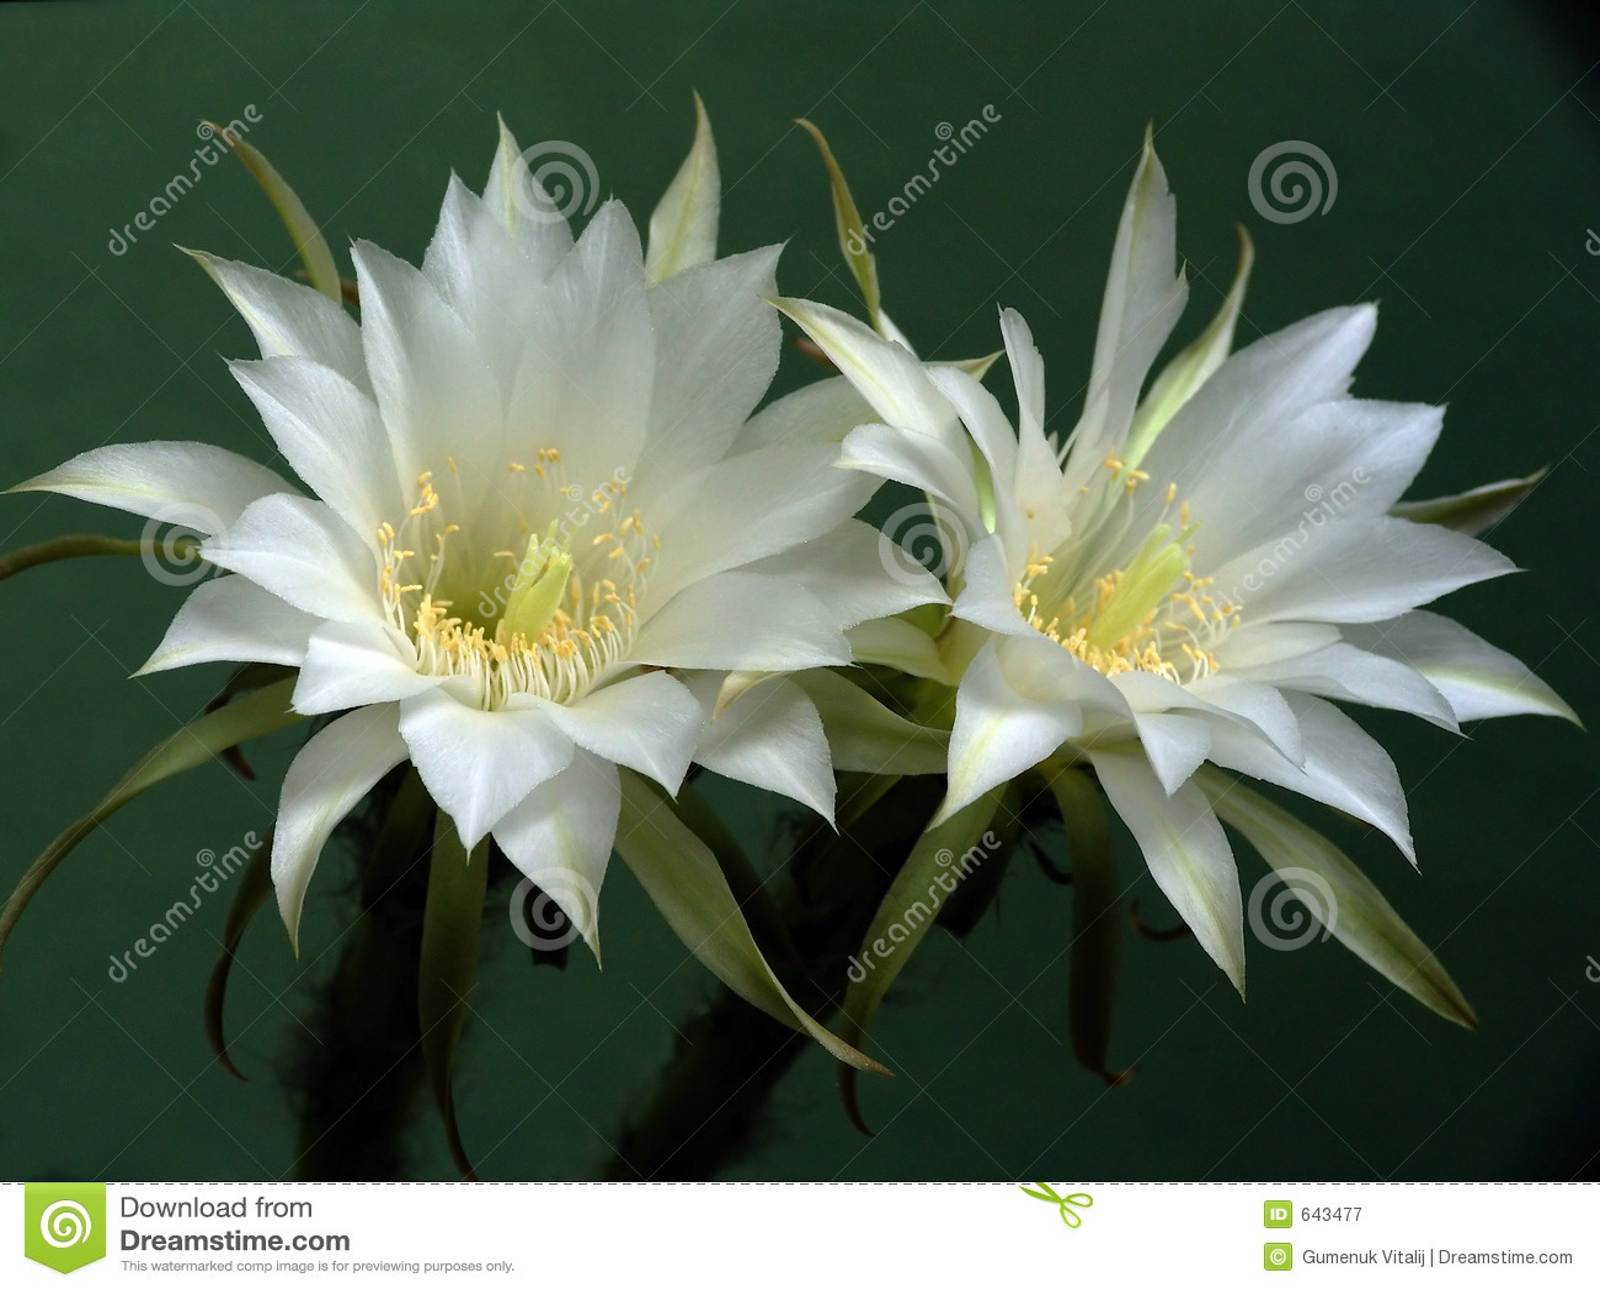 Download Blossoming семья Echinopsis кактуса Стоковое Изображение - изображение насчитывающей кактус, цветок: 643477